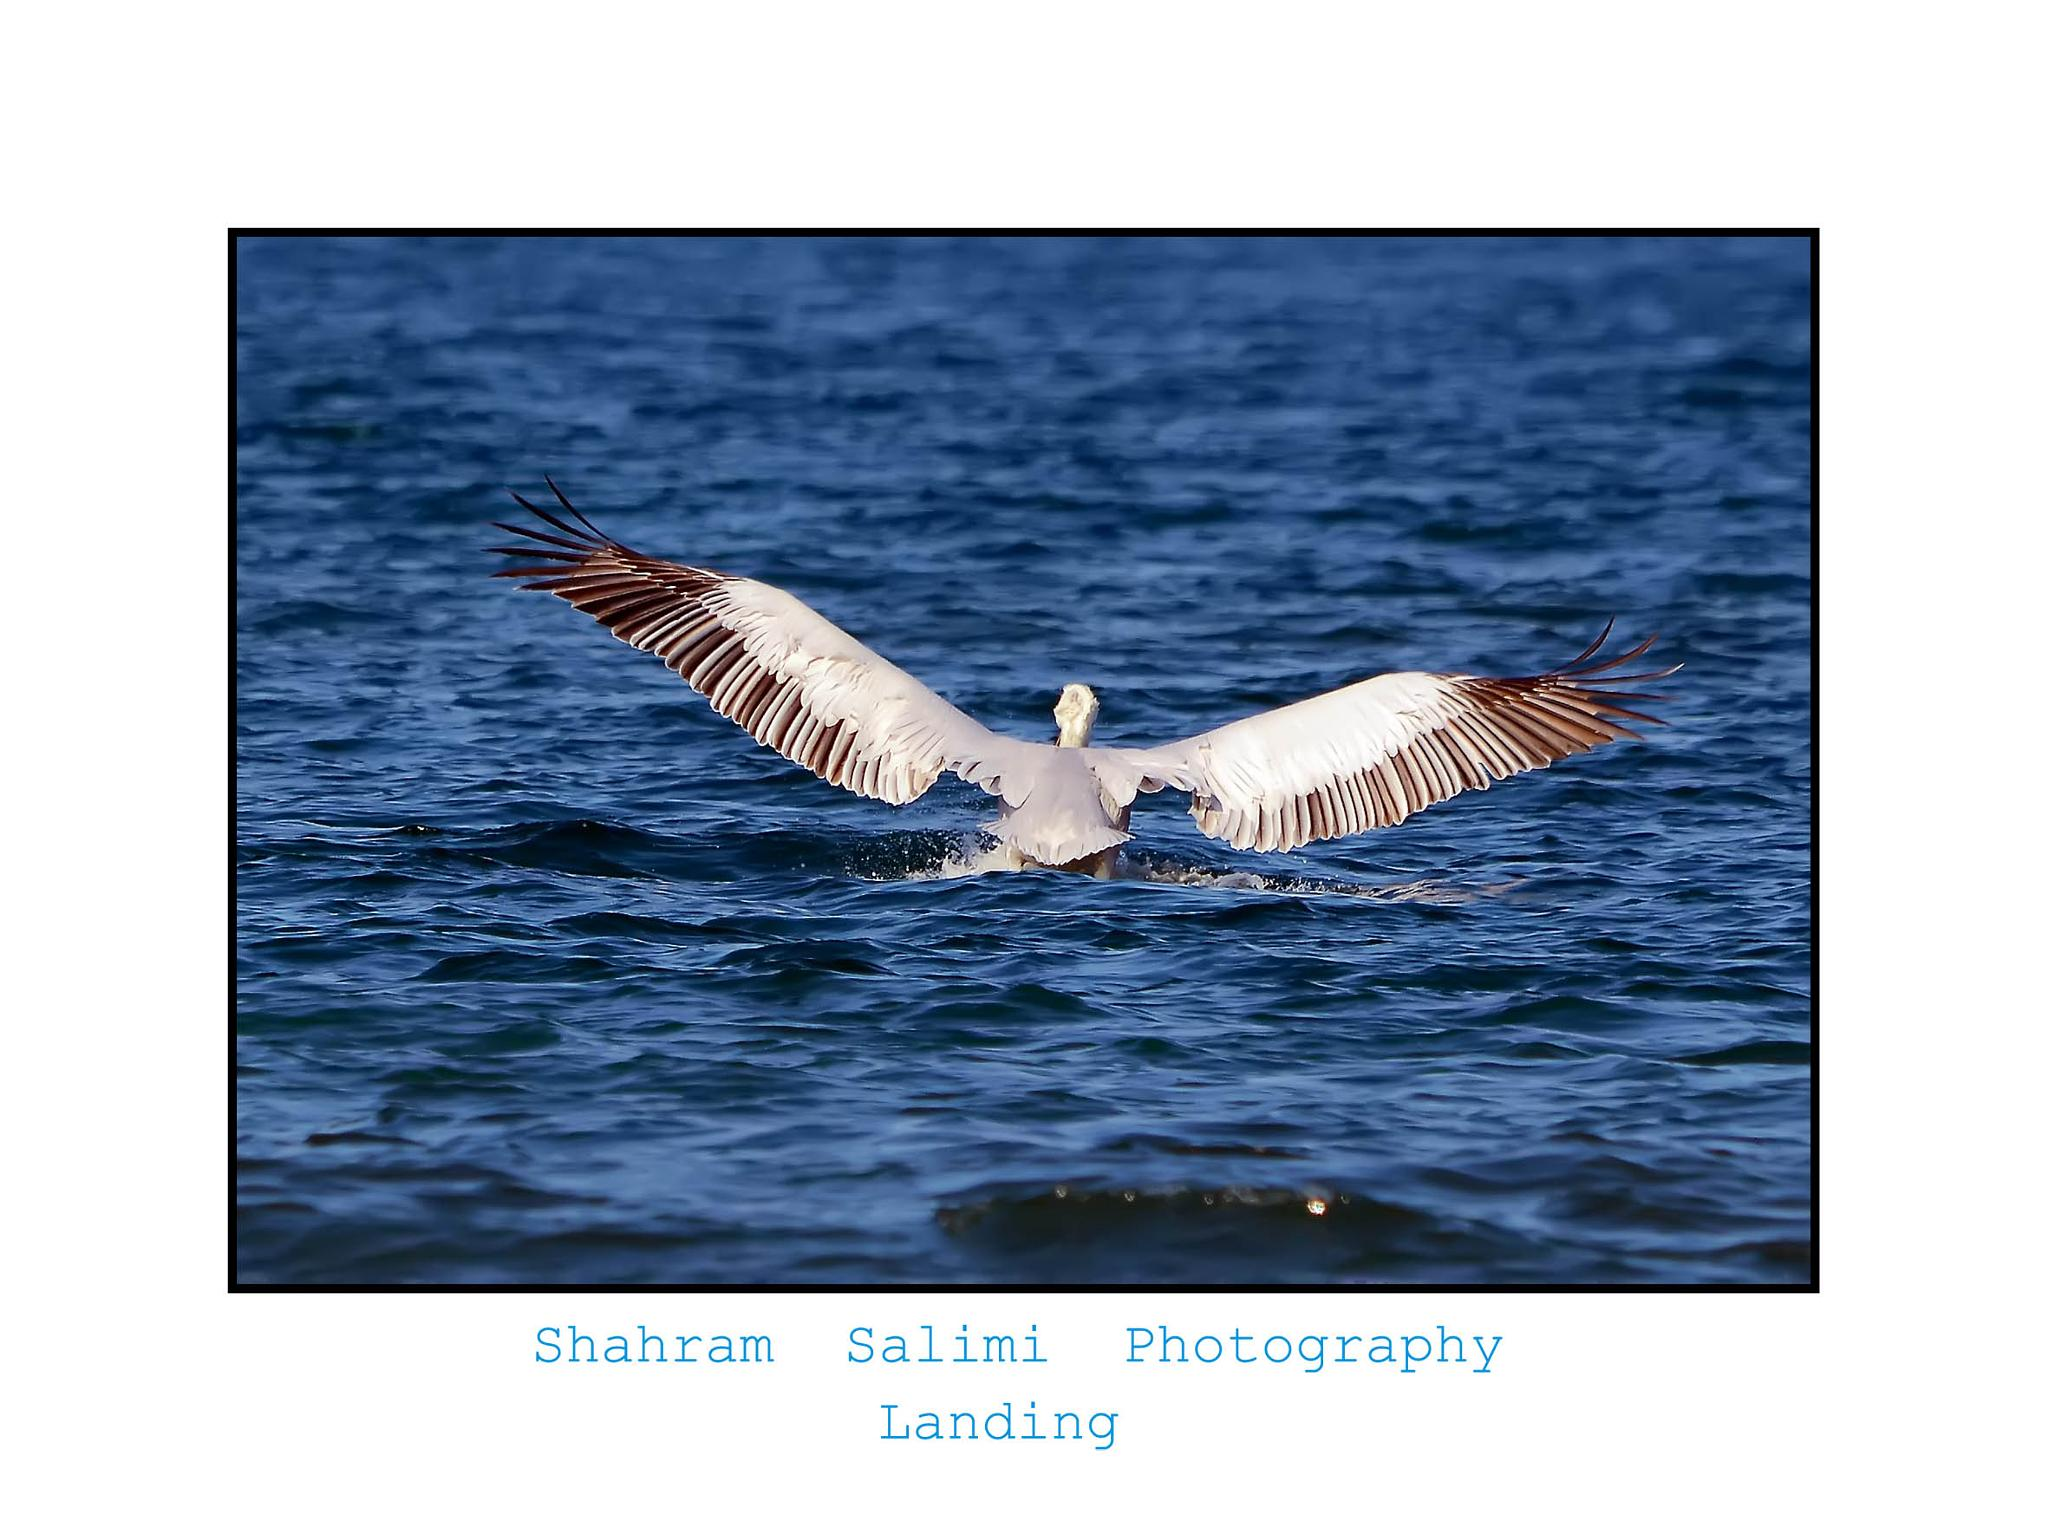 landing by Shahram Salimi